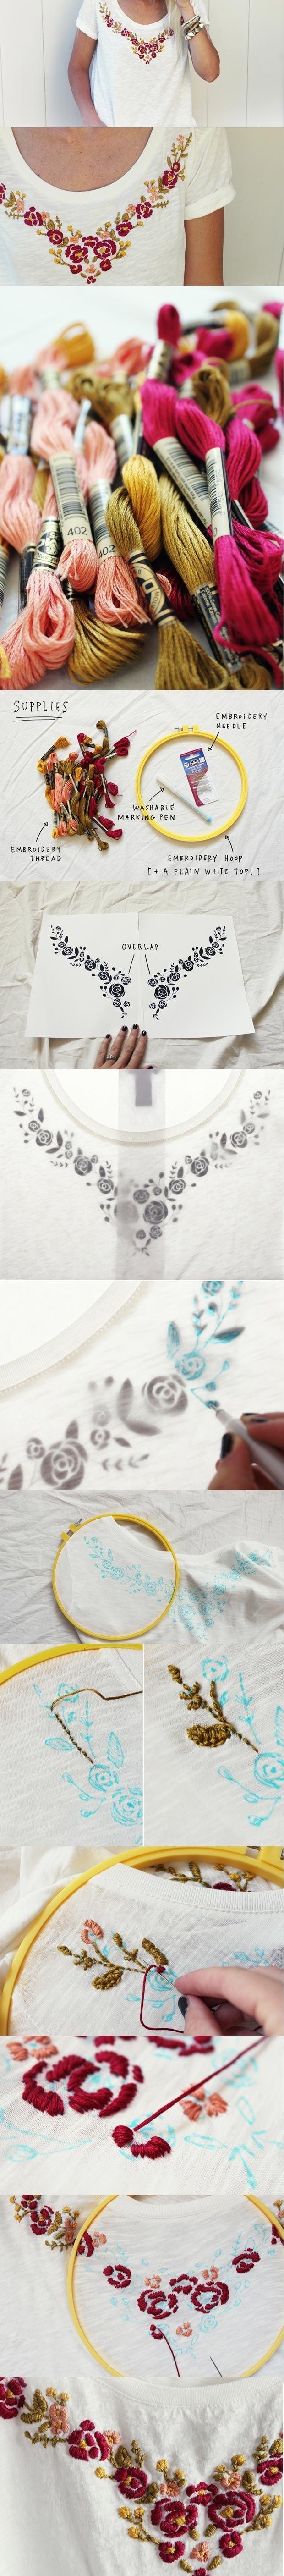 DIY Hand Embroidered Tshirt inspiration